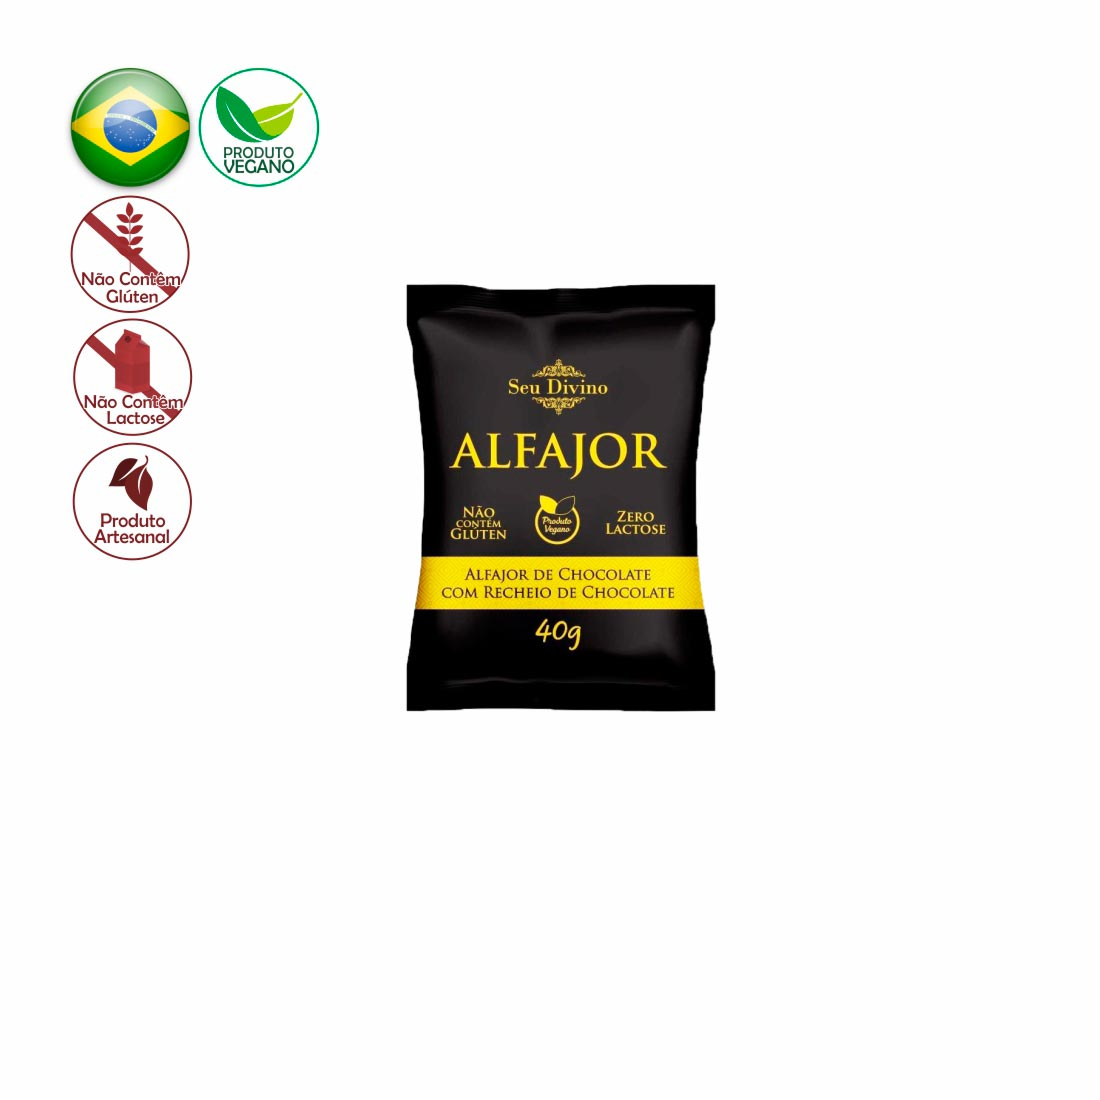 ALFAJOR NEGRO SEU DIVINO CHOCOLATE C/ CHOCOLATE S/ GLÚTEN, ZERO LACTOSE E VEGANO 40G